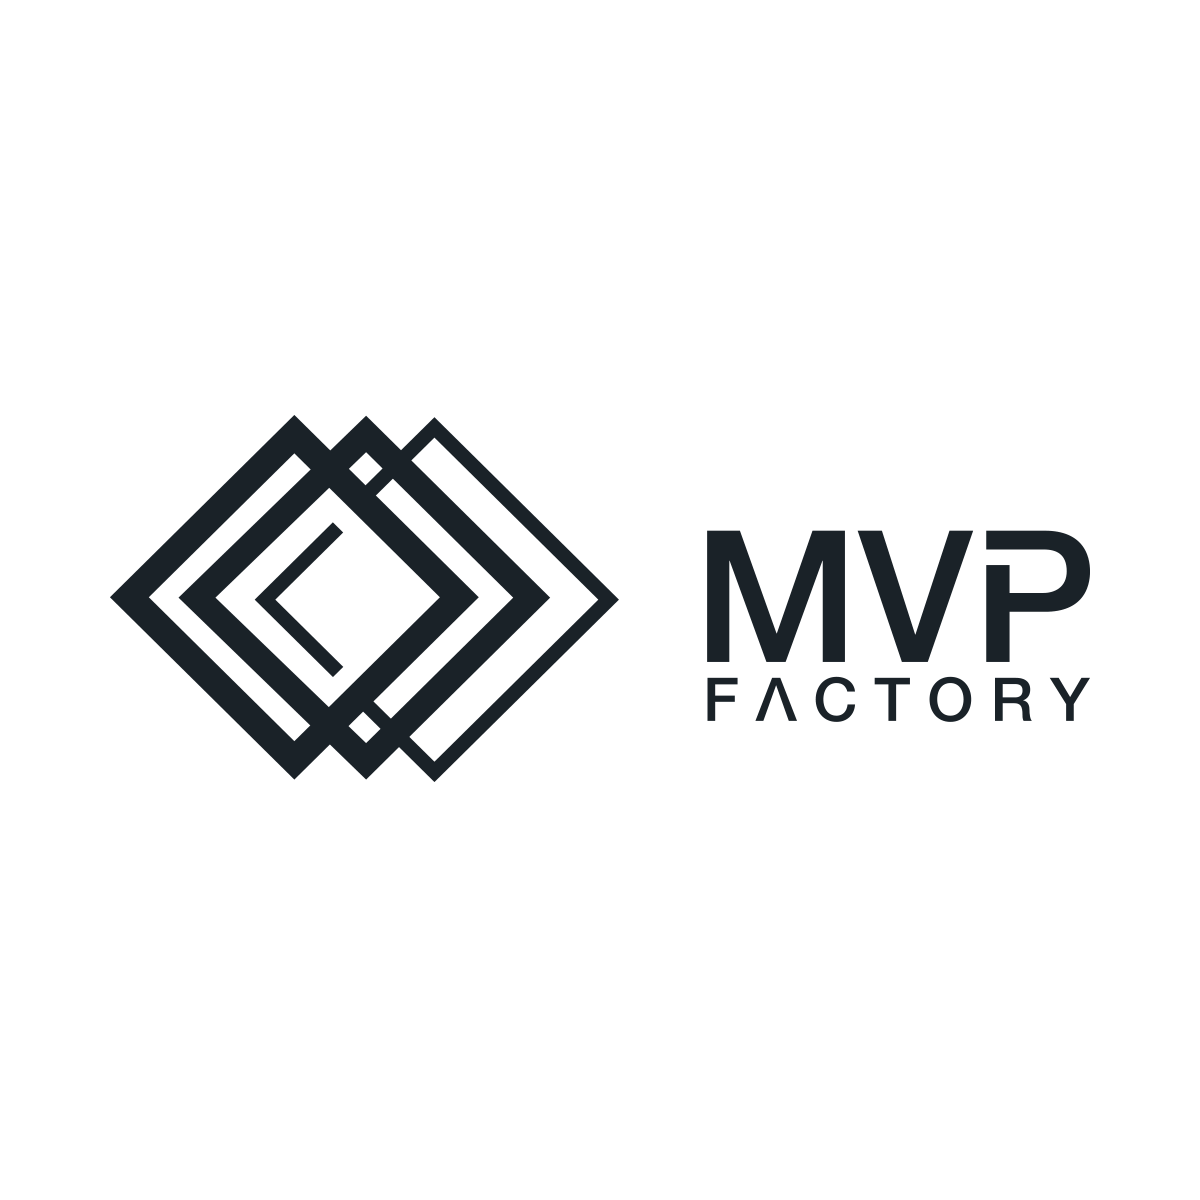 MVP Factory logo